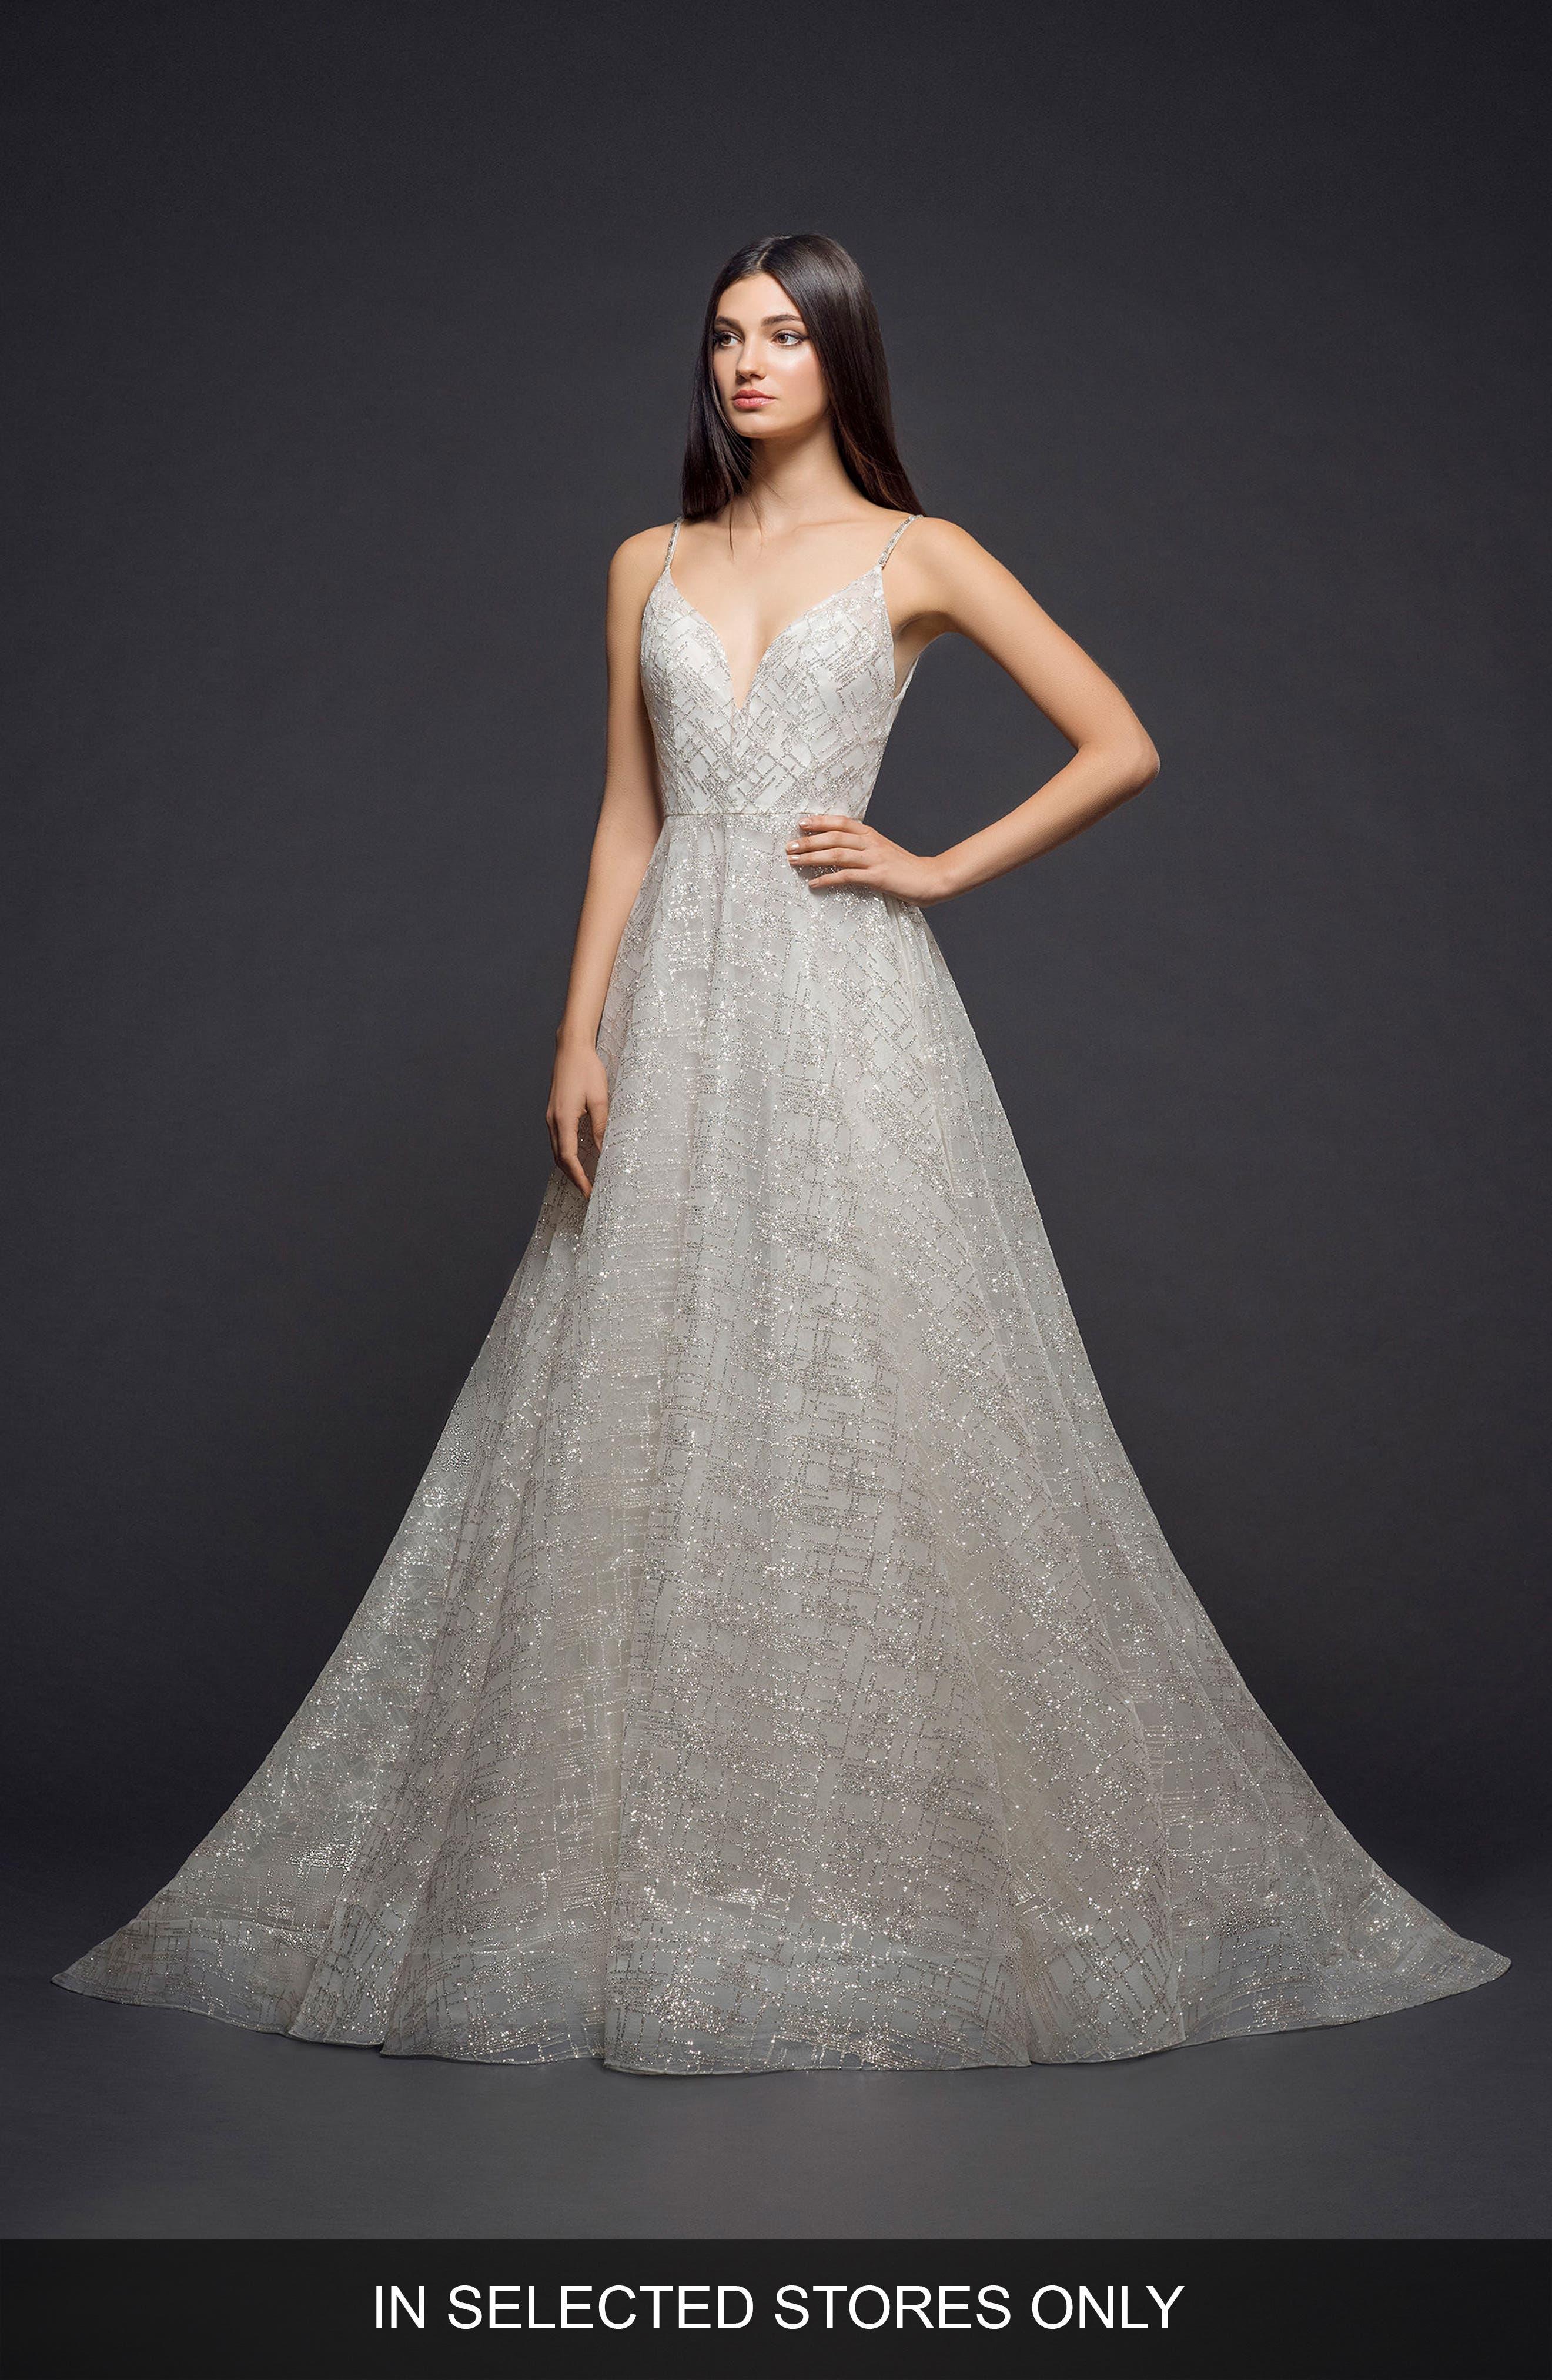 Sparkle Plaid Tulle A-Line Gown,                             Main thumbnail 1, color,                             IVORY